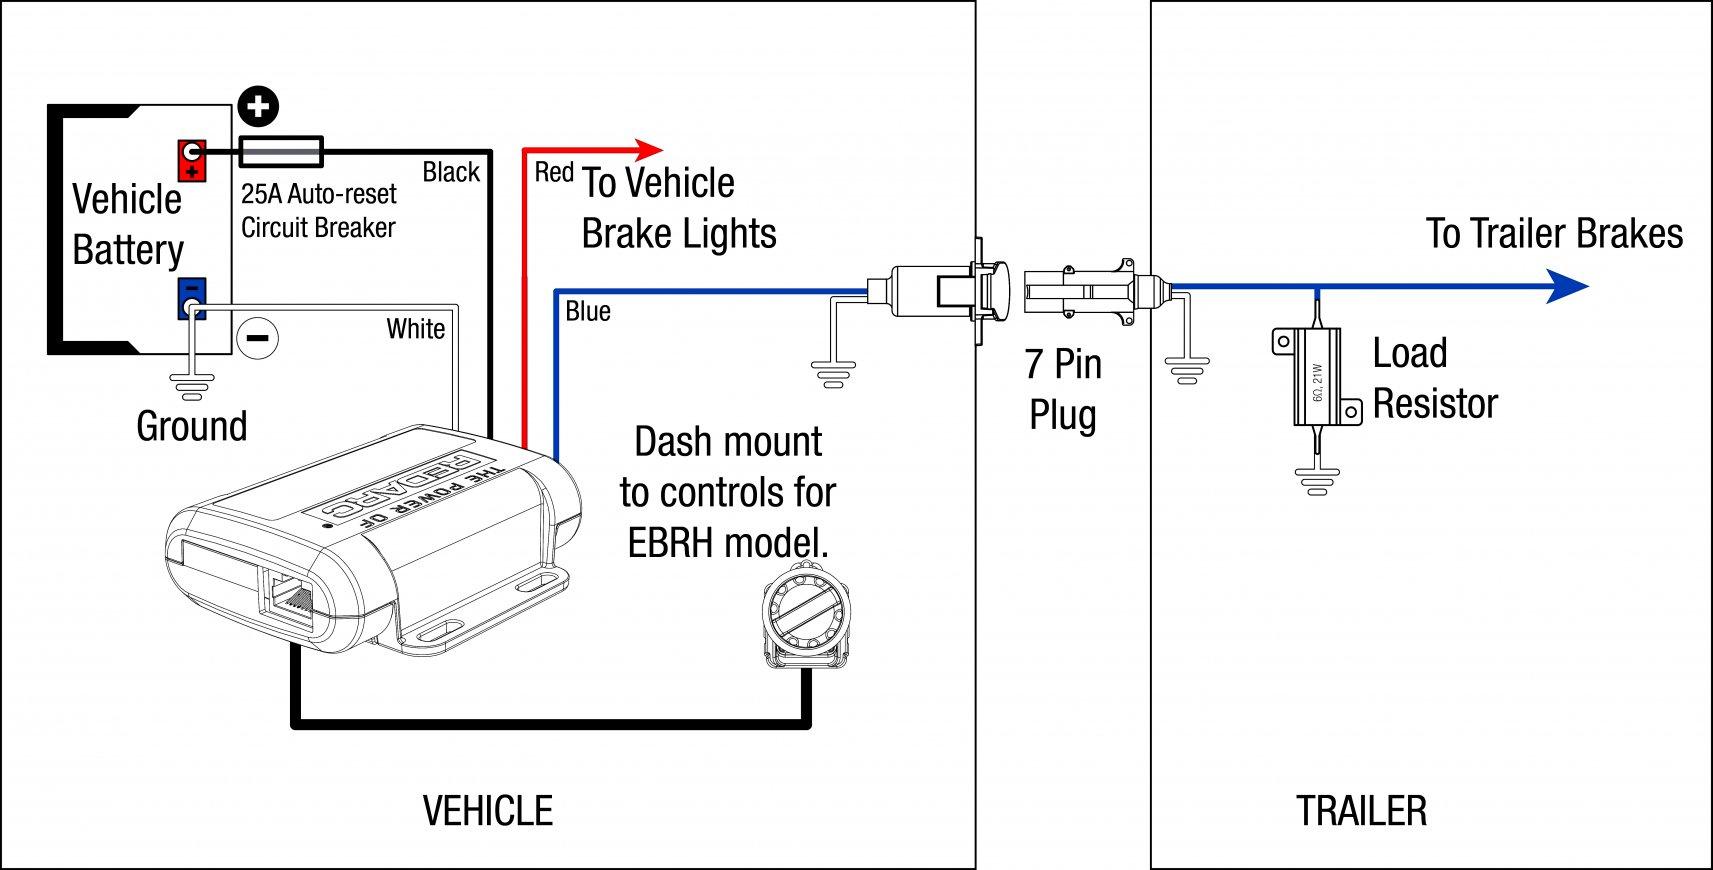 Tekonsha Brake Controller Wiring Diagram For Chevy | Wiring Diagram - Tekonsha Brake Controller Wiring Diagram